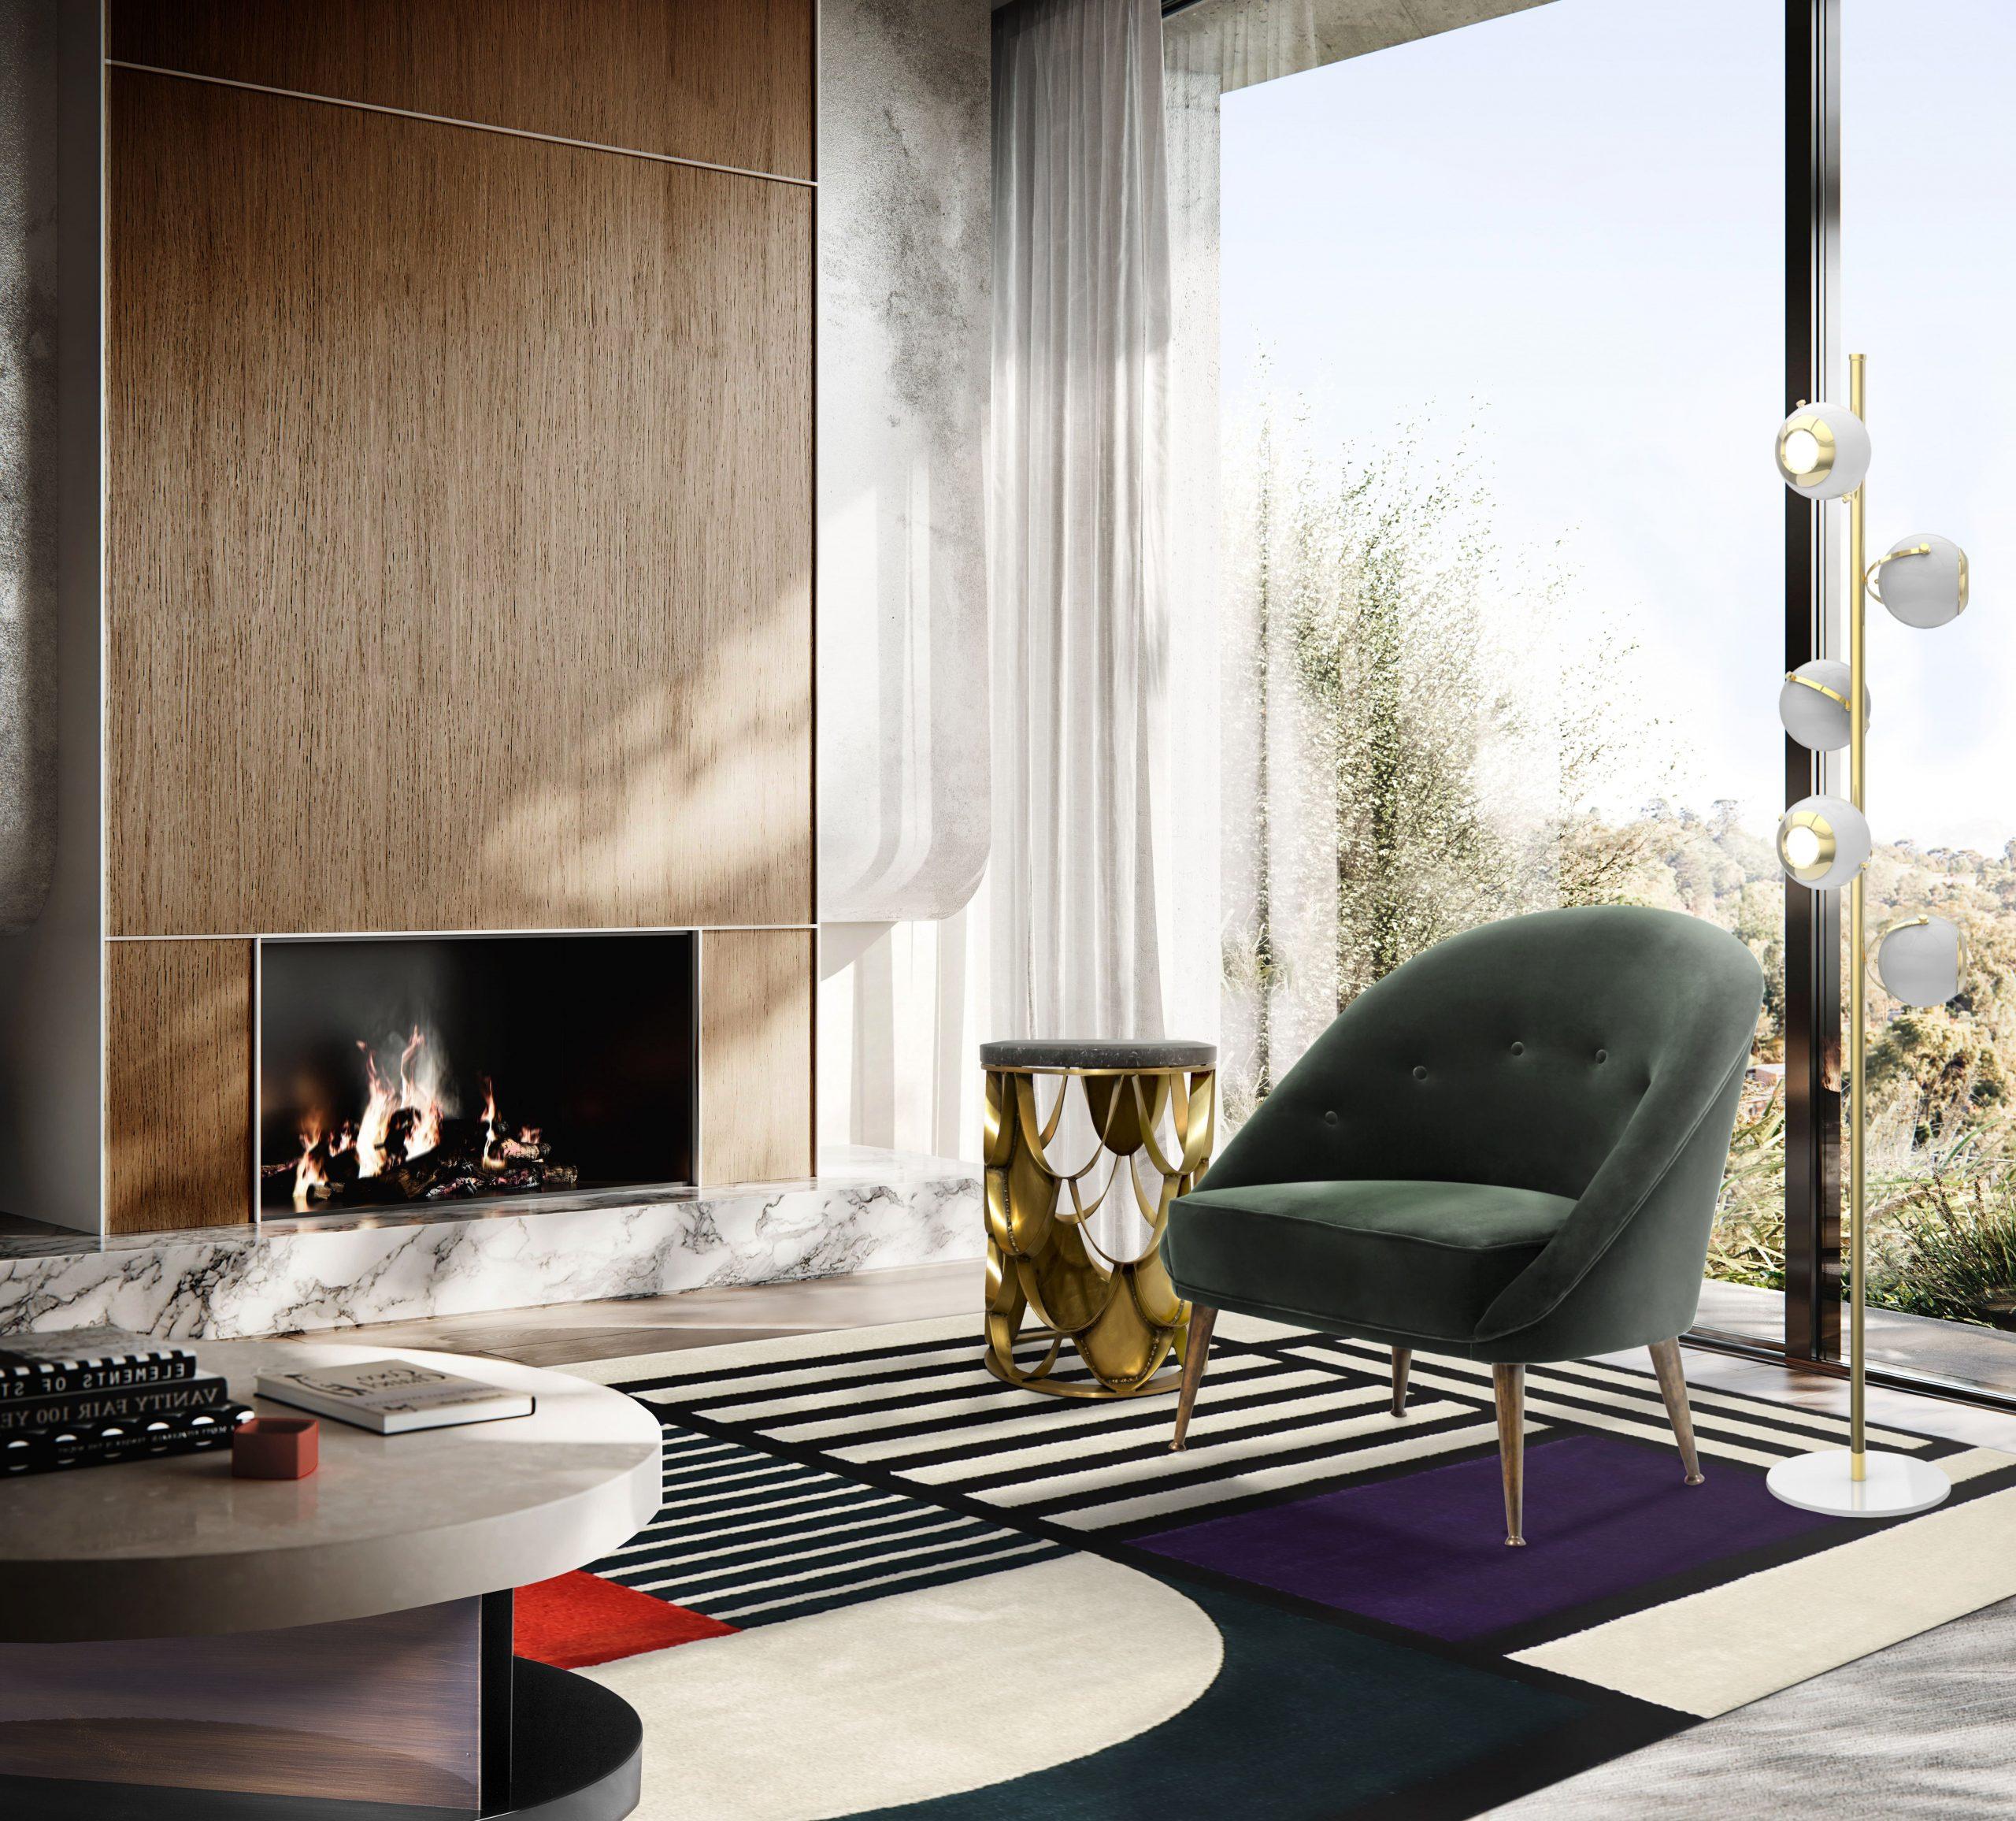 5 mid-century modern rug ideas - Mid-cenutry Living Room With Prisma I Rug